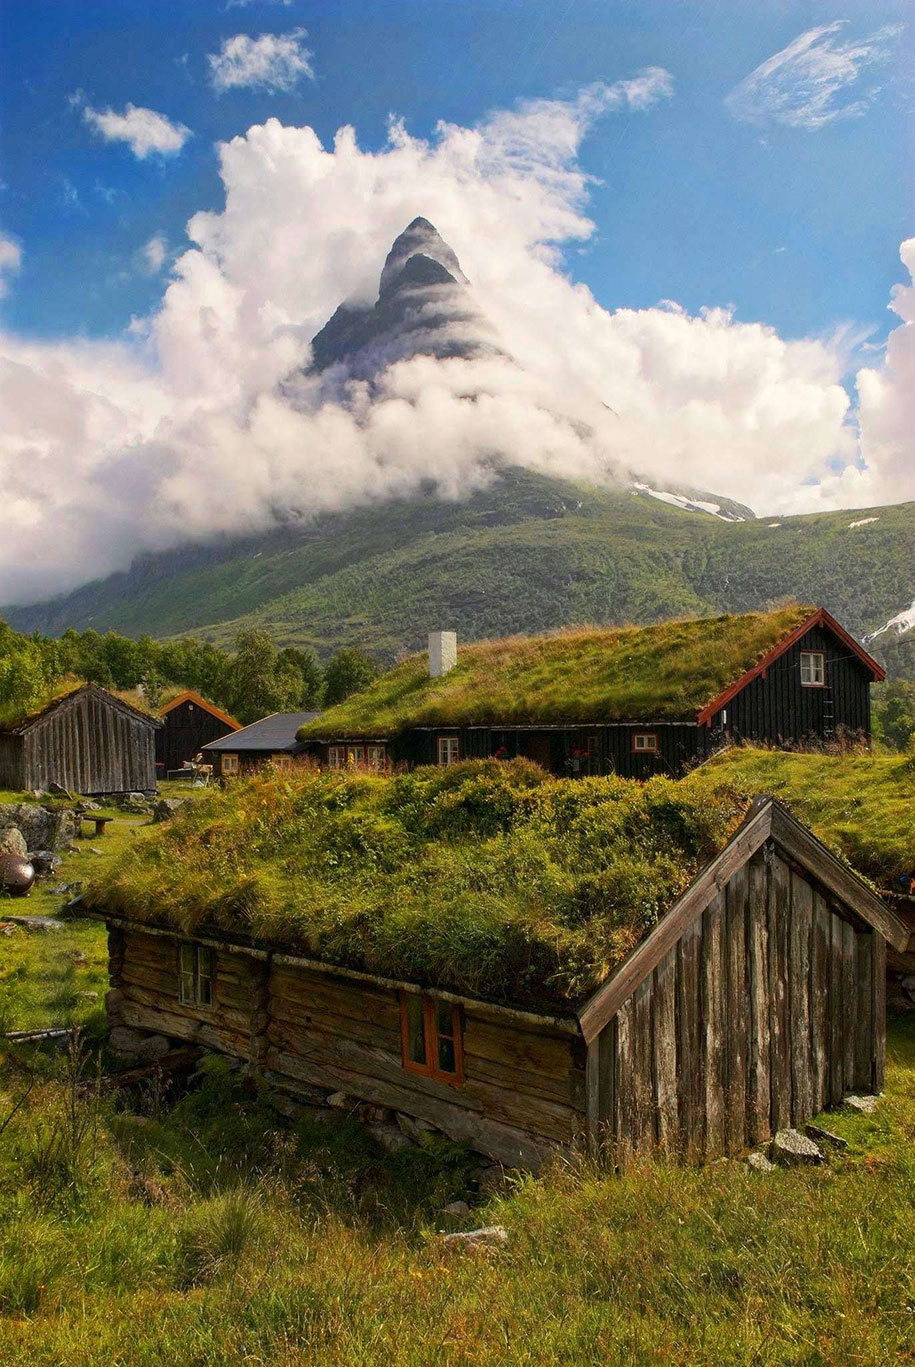 fairytale-photos-nature-architecture-buildings-norway-24